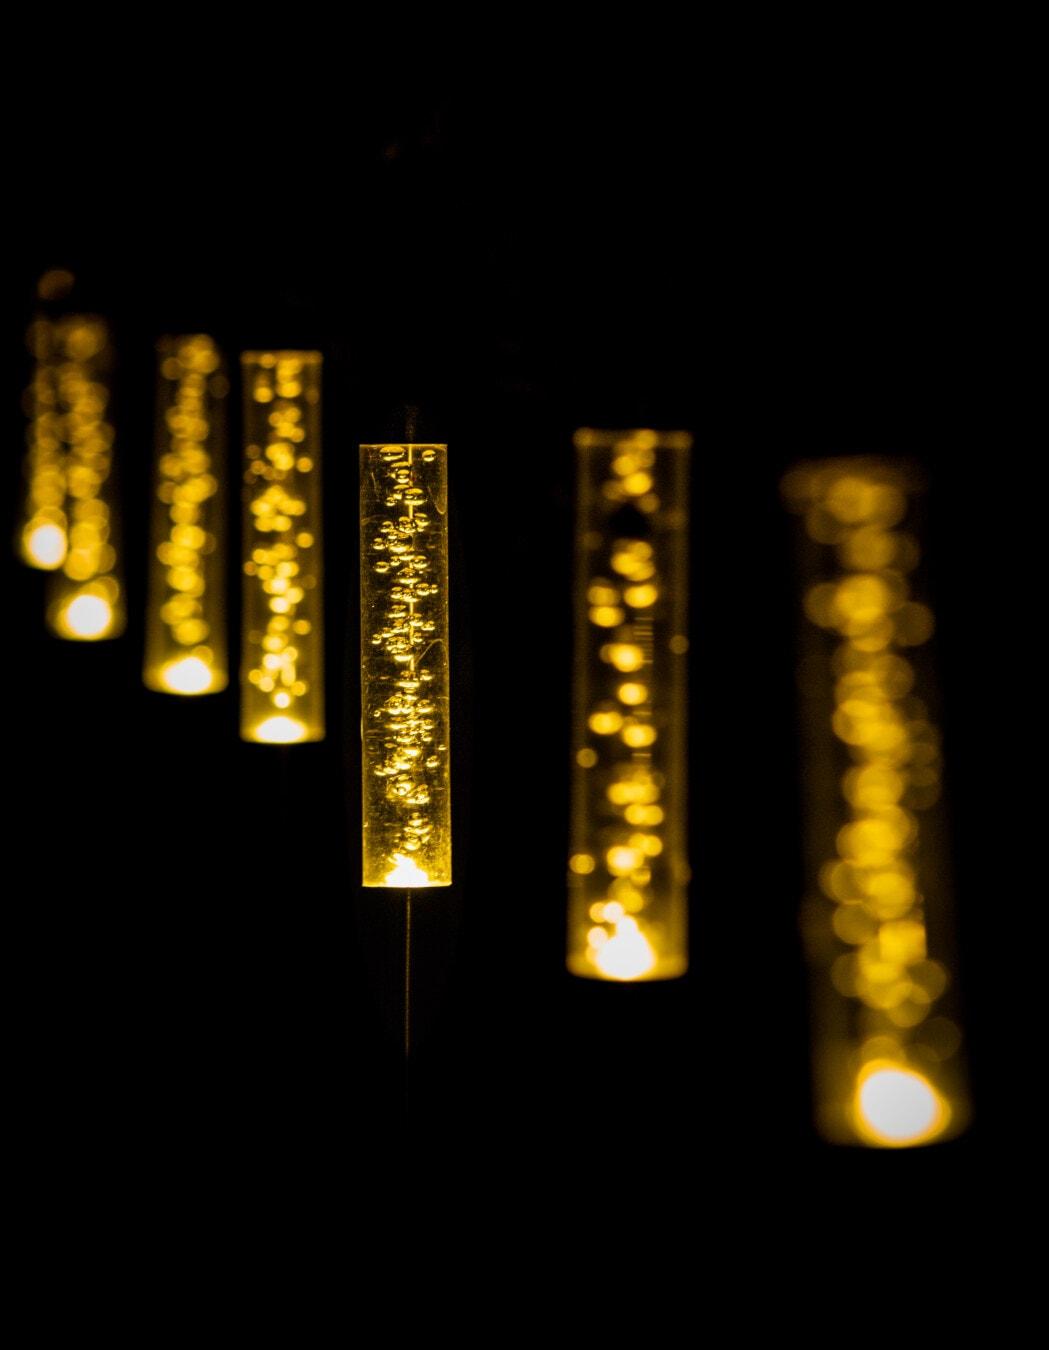 darkness, night, lamp, lantern, plastic, light bulb, bauble, light, illuminated, dark